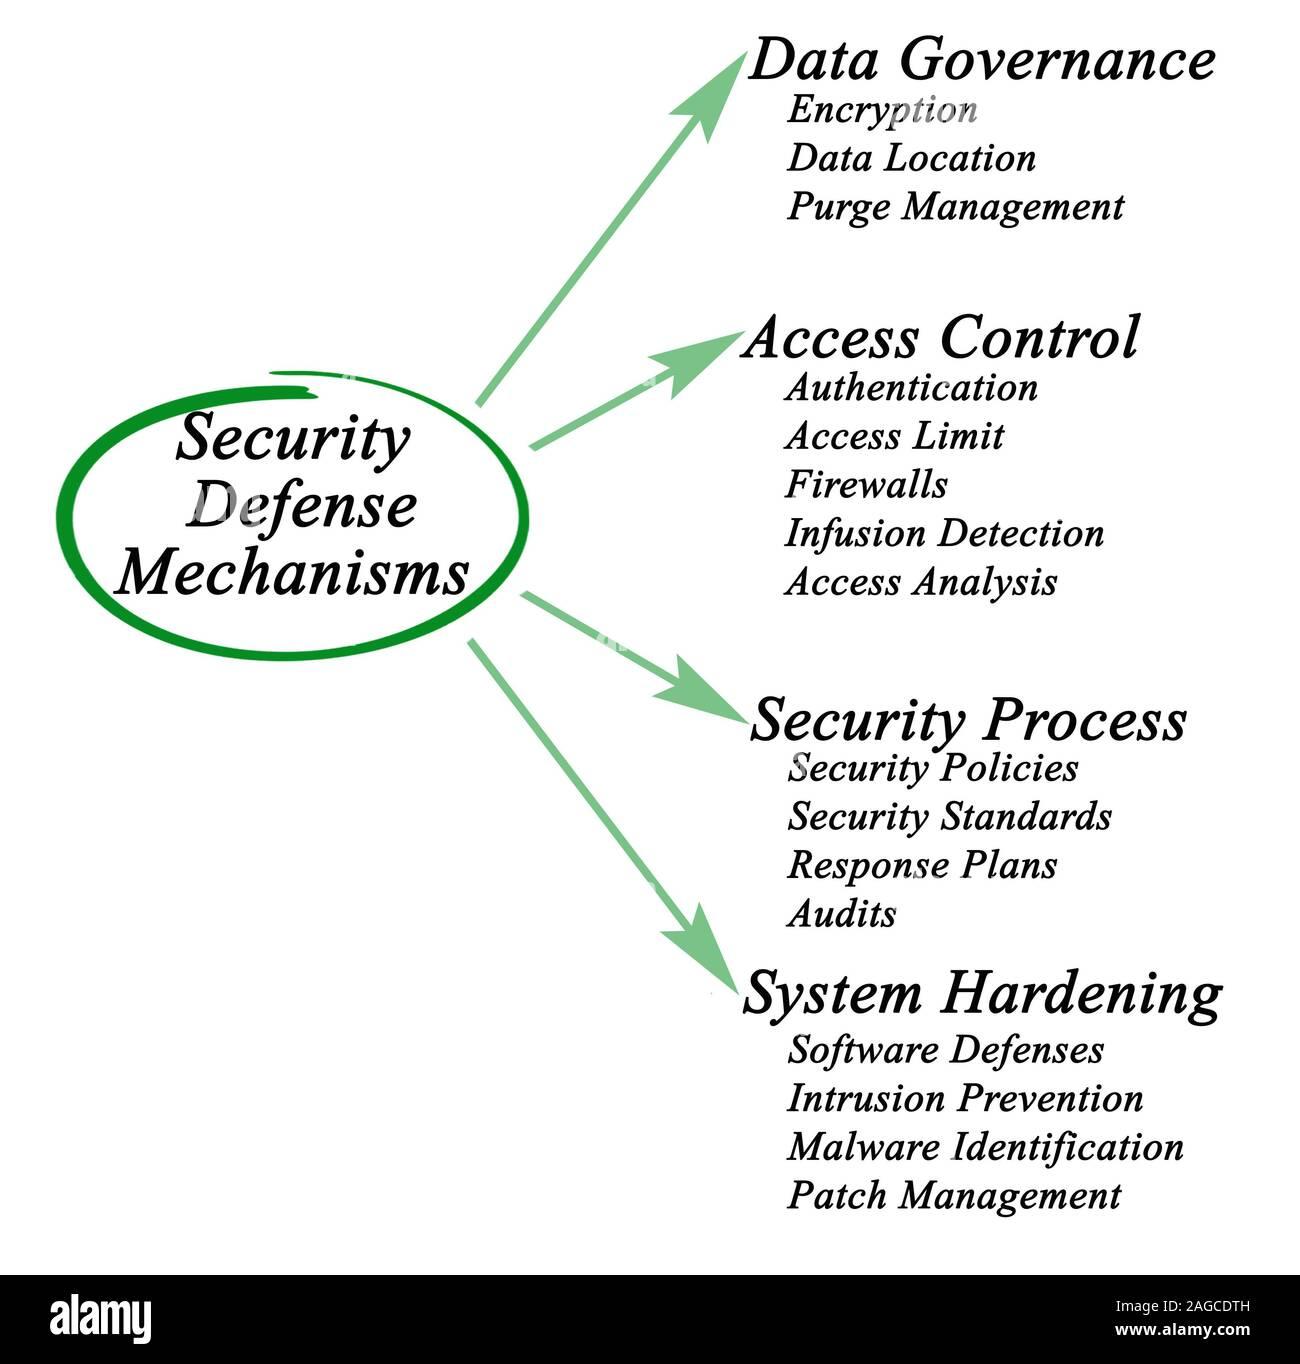 Security Defense Mechanisms Stock Photo Alamy